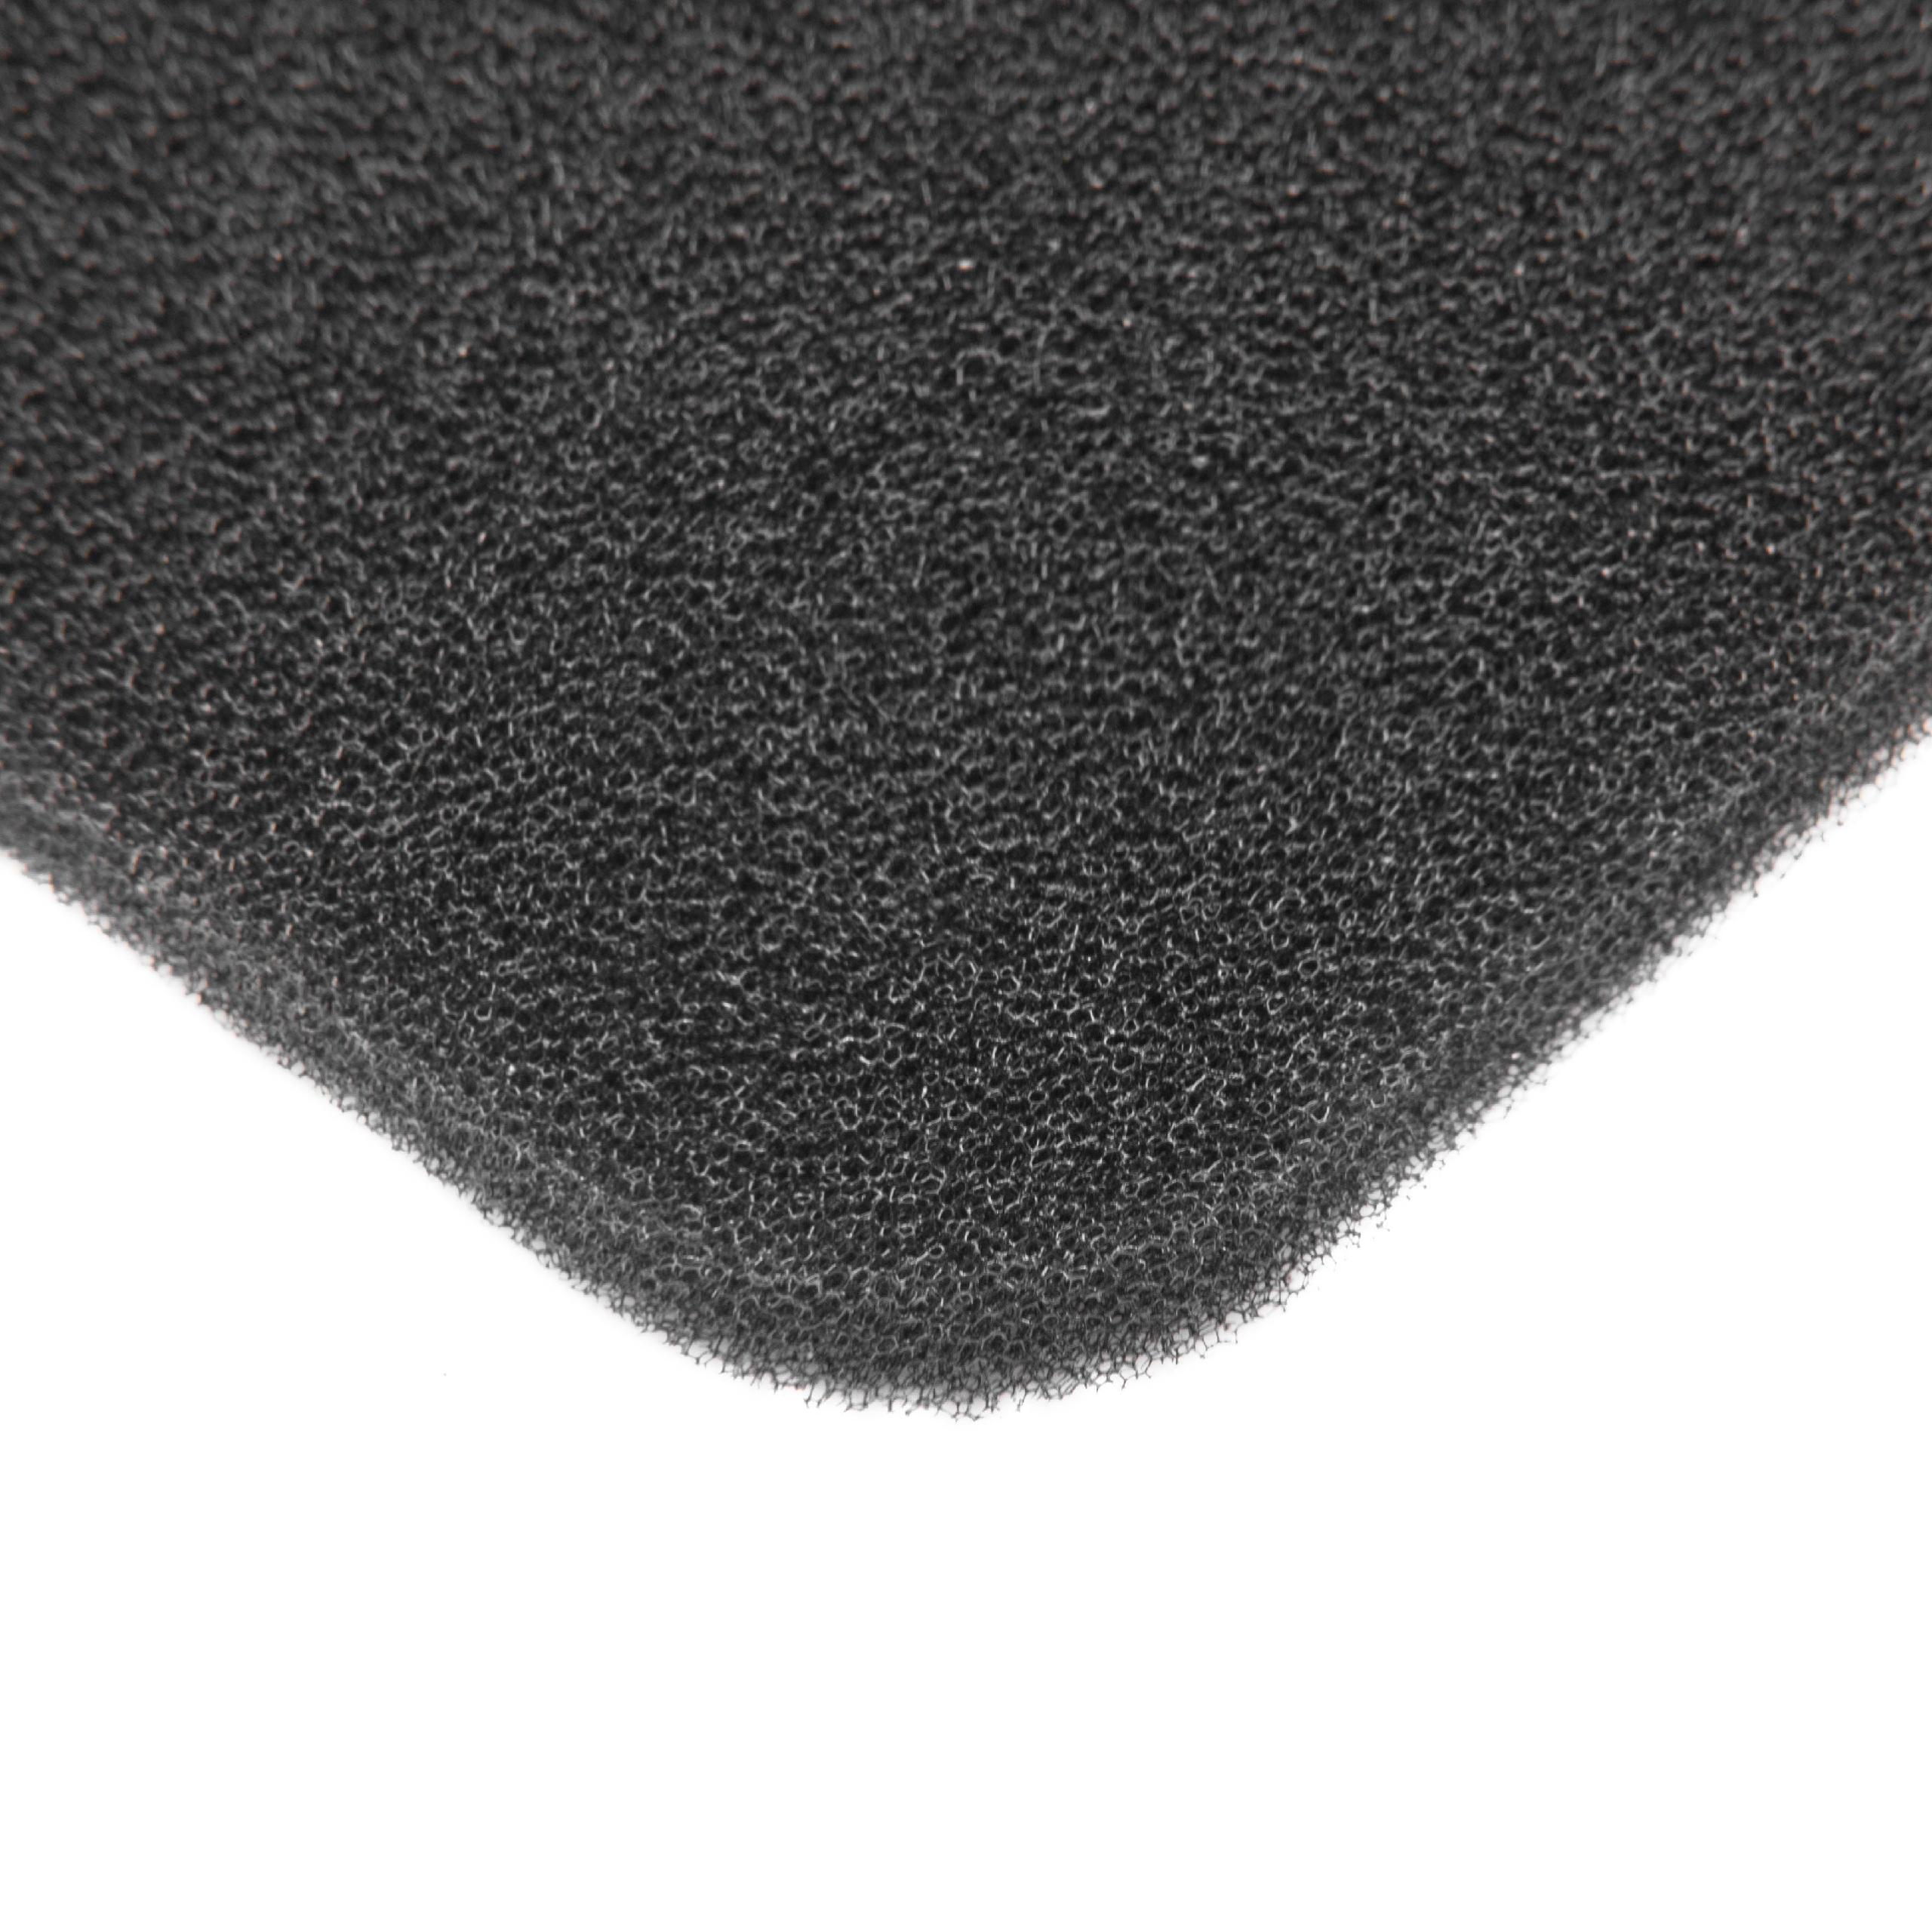 3x Filtro a spugna per Hoover DYC 9914AX-S 31100486 DYH 983NA1-S 31100640